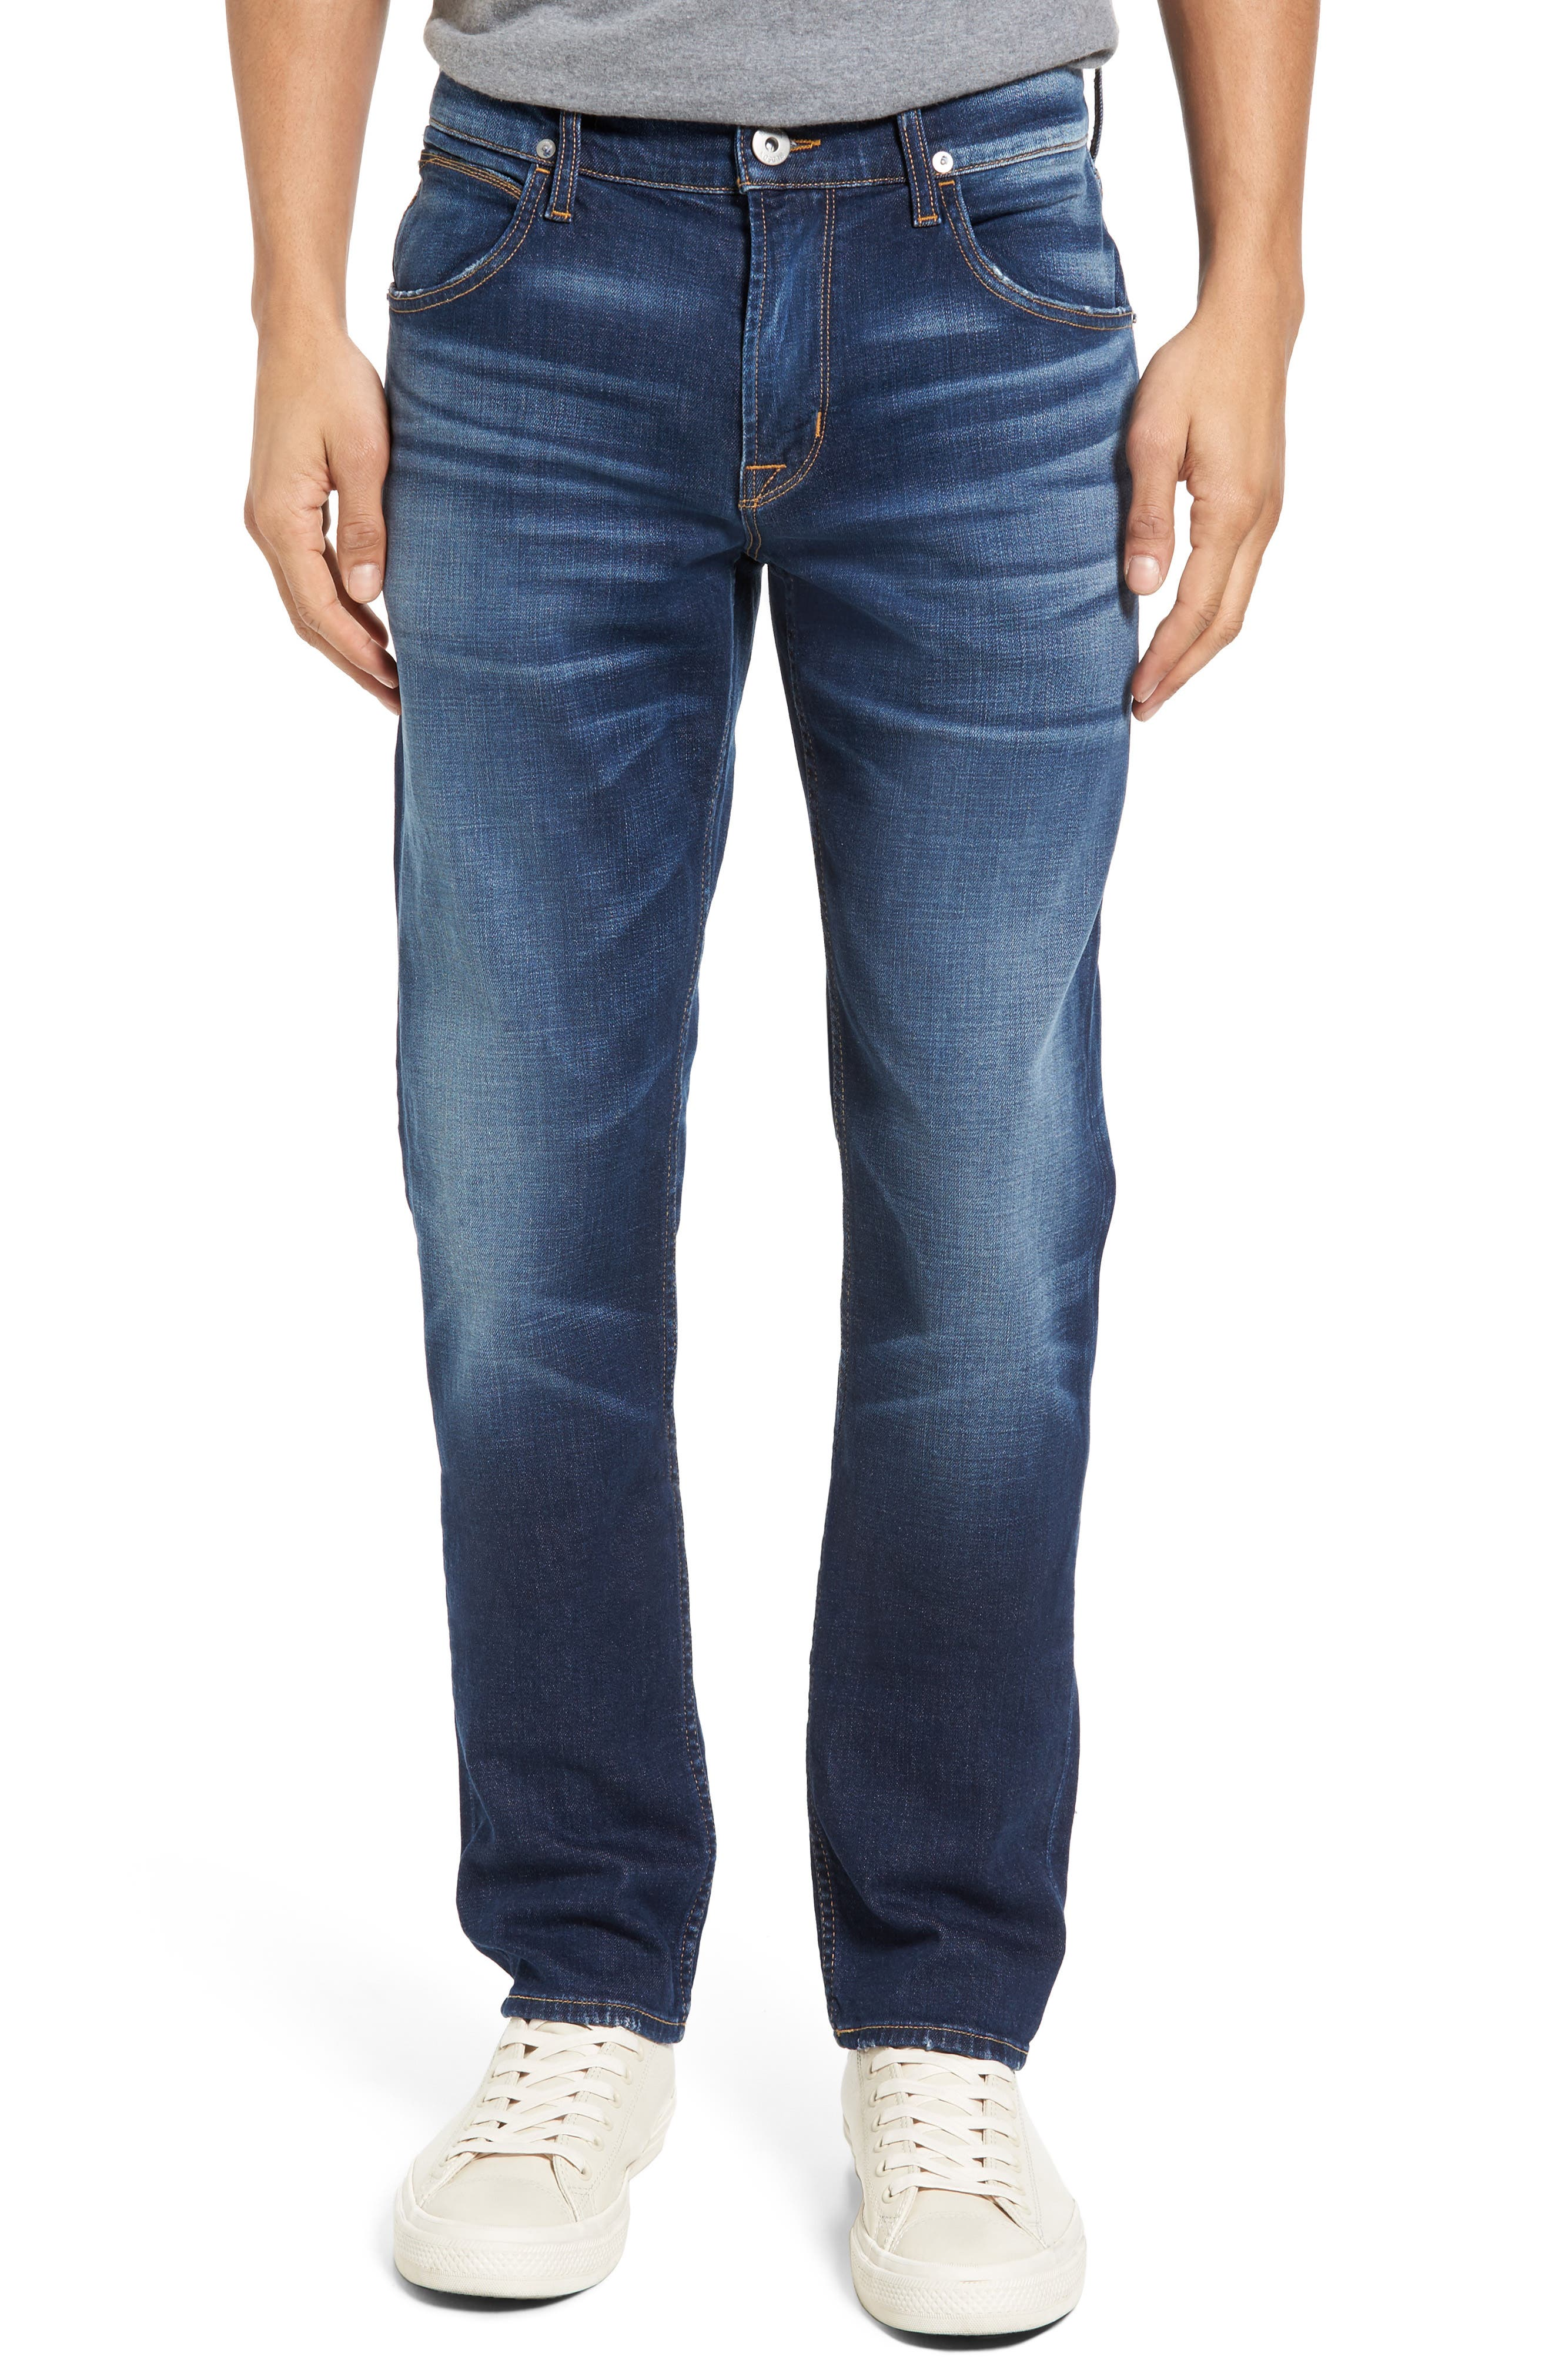 Blake Slim Fit Jeans,                             Main thumbnail 1, color,                             426